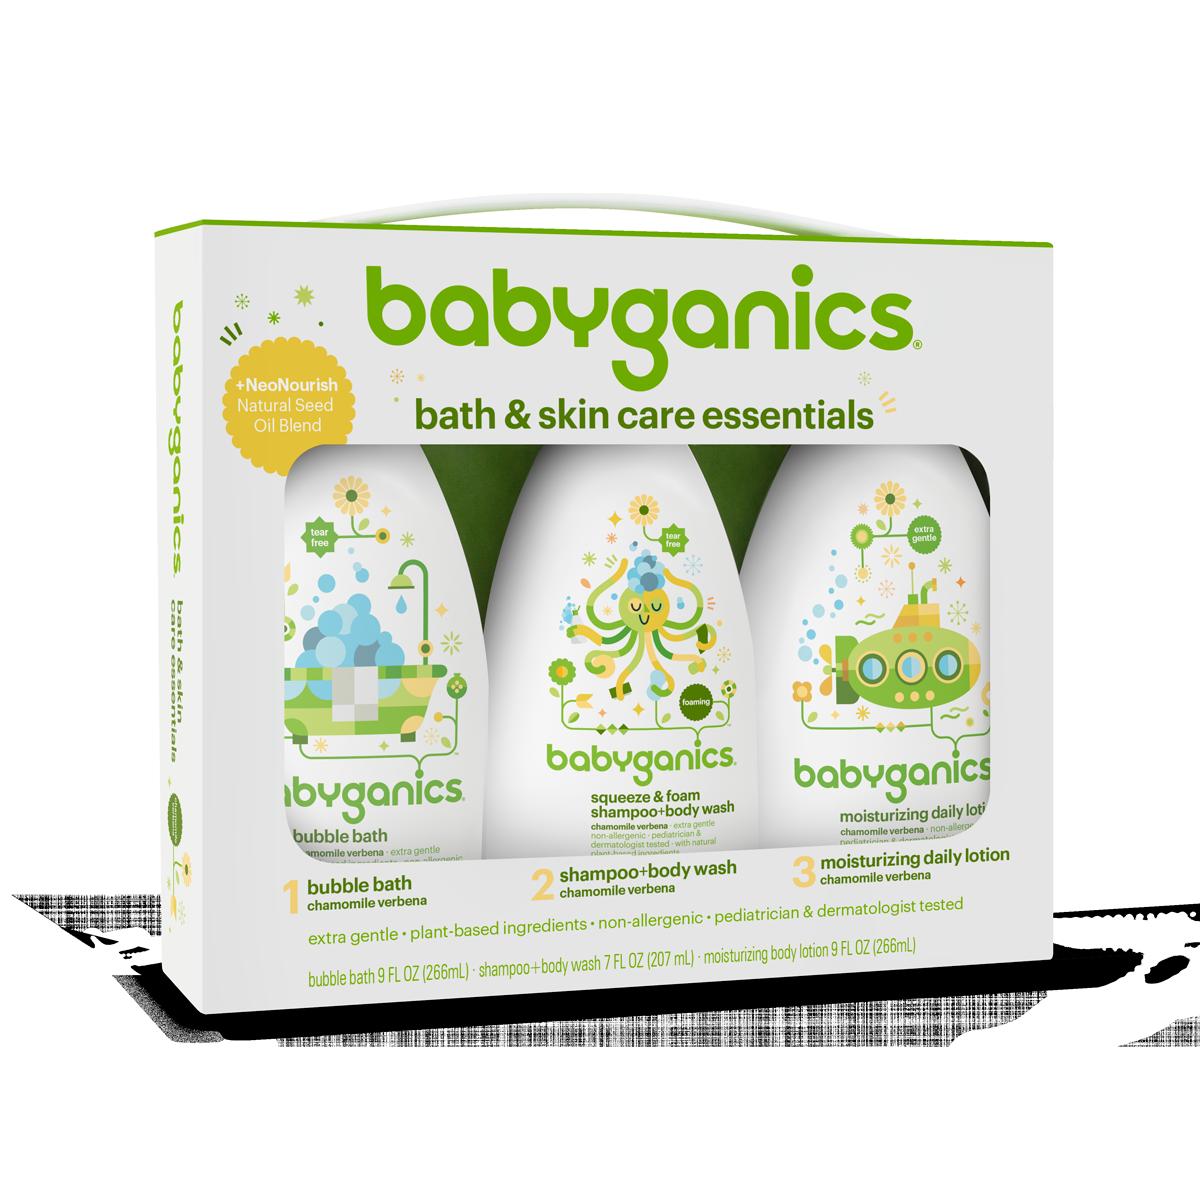 Shampoo clipart baby wash. Bath and skin care